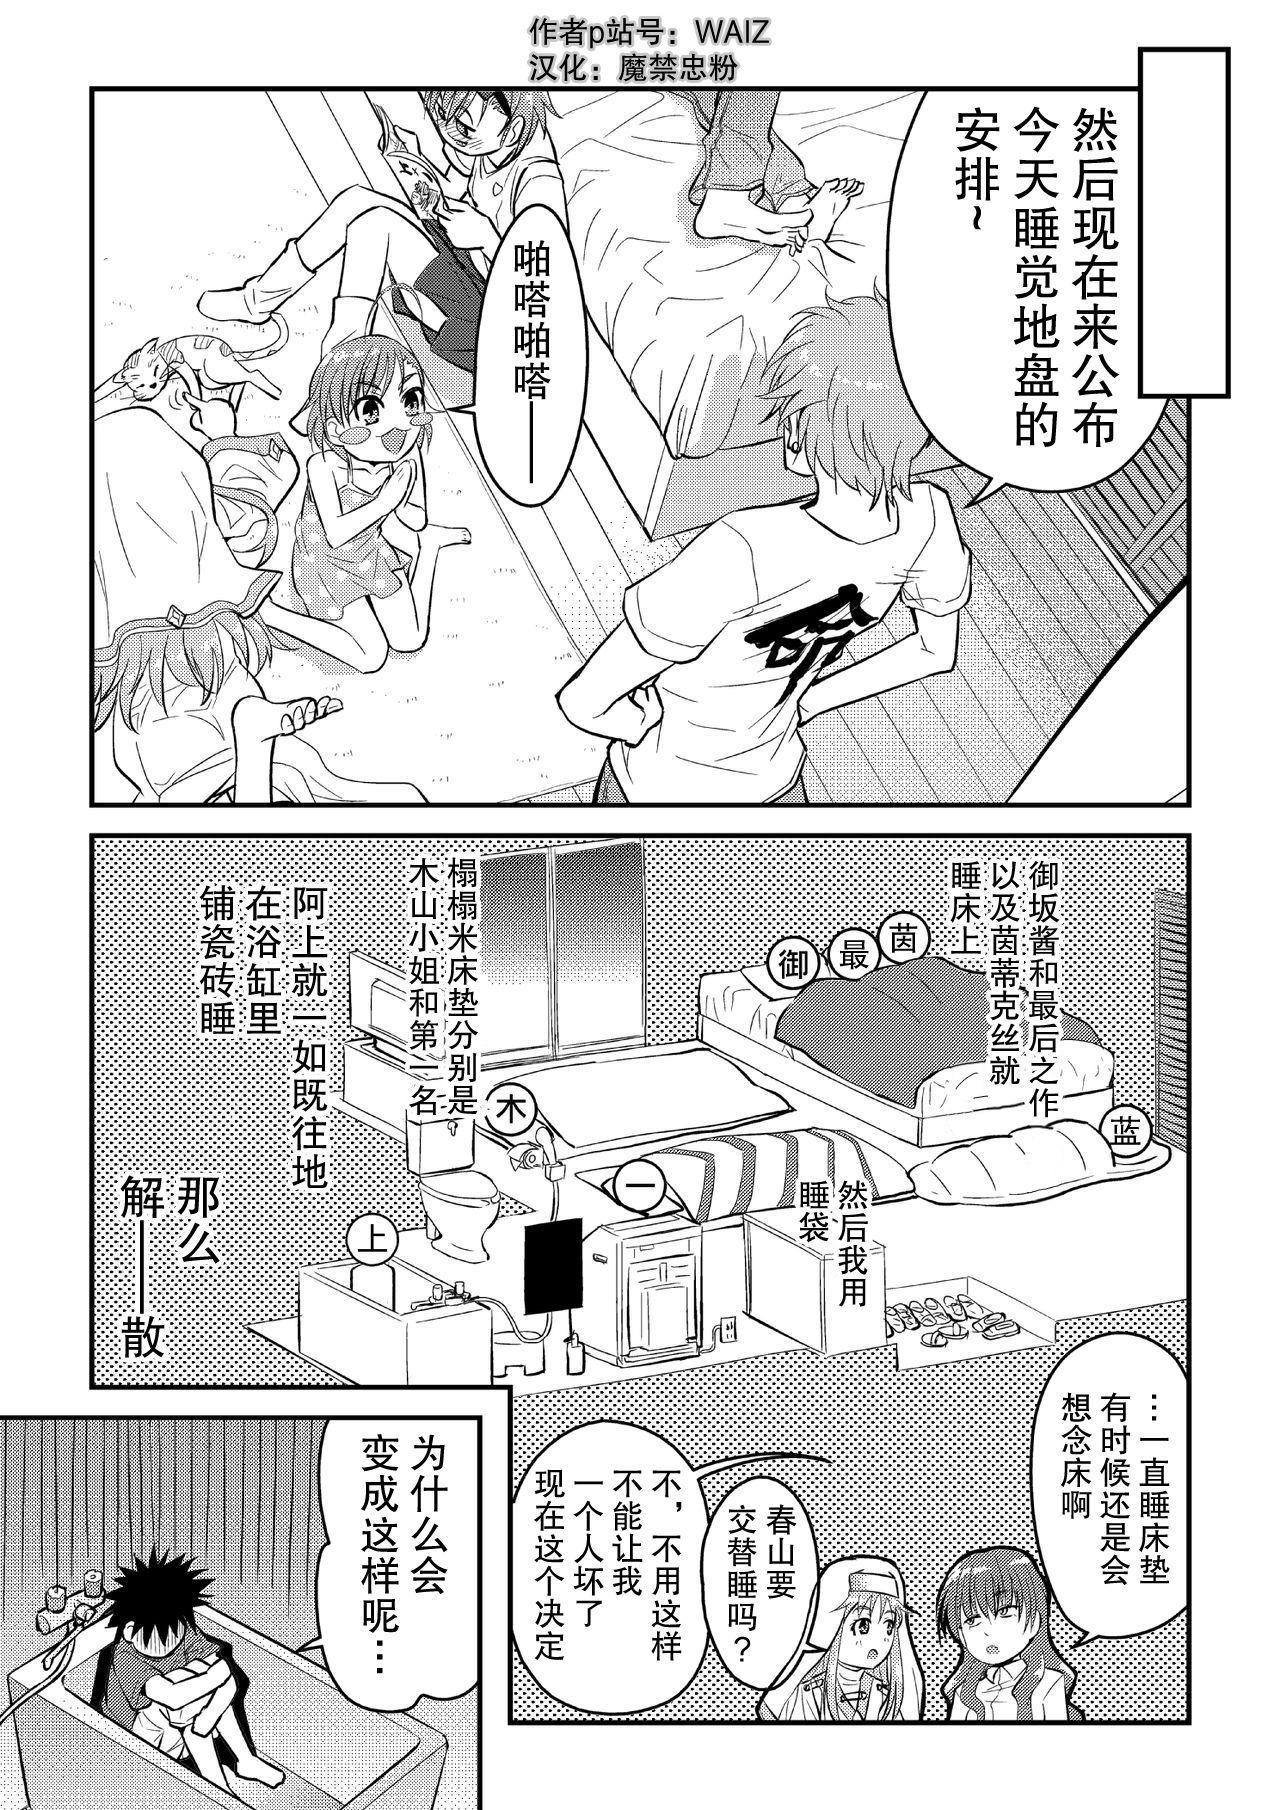 [WAIZ][同人个人渣汉化][就算是上条先生我家要住7个人还是太勉强了](Toaru Majutsu no Index) [中国翻译] 15